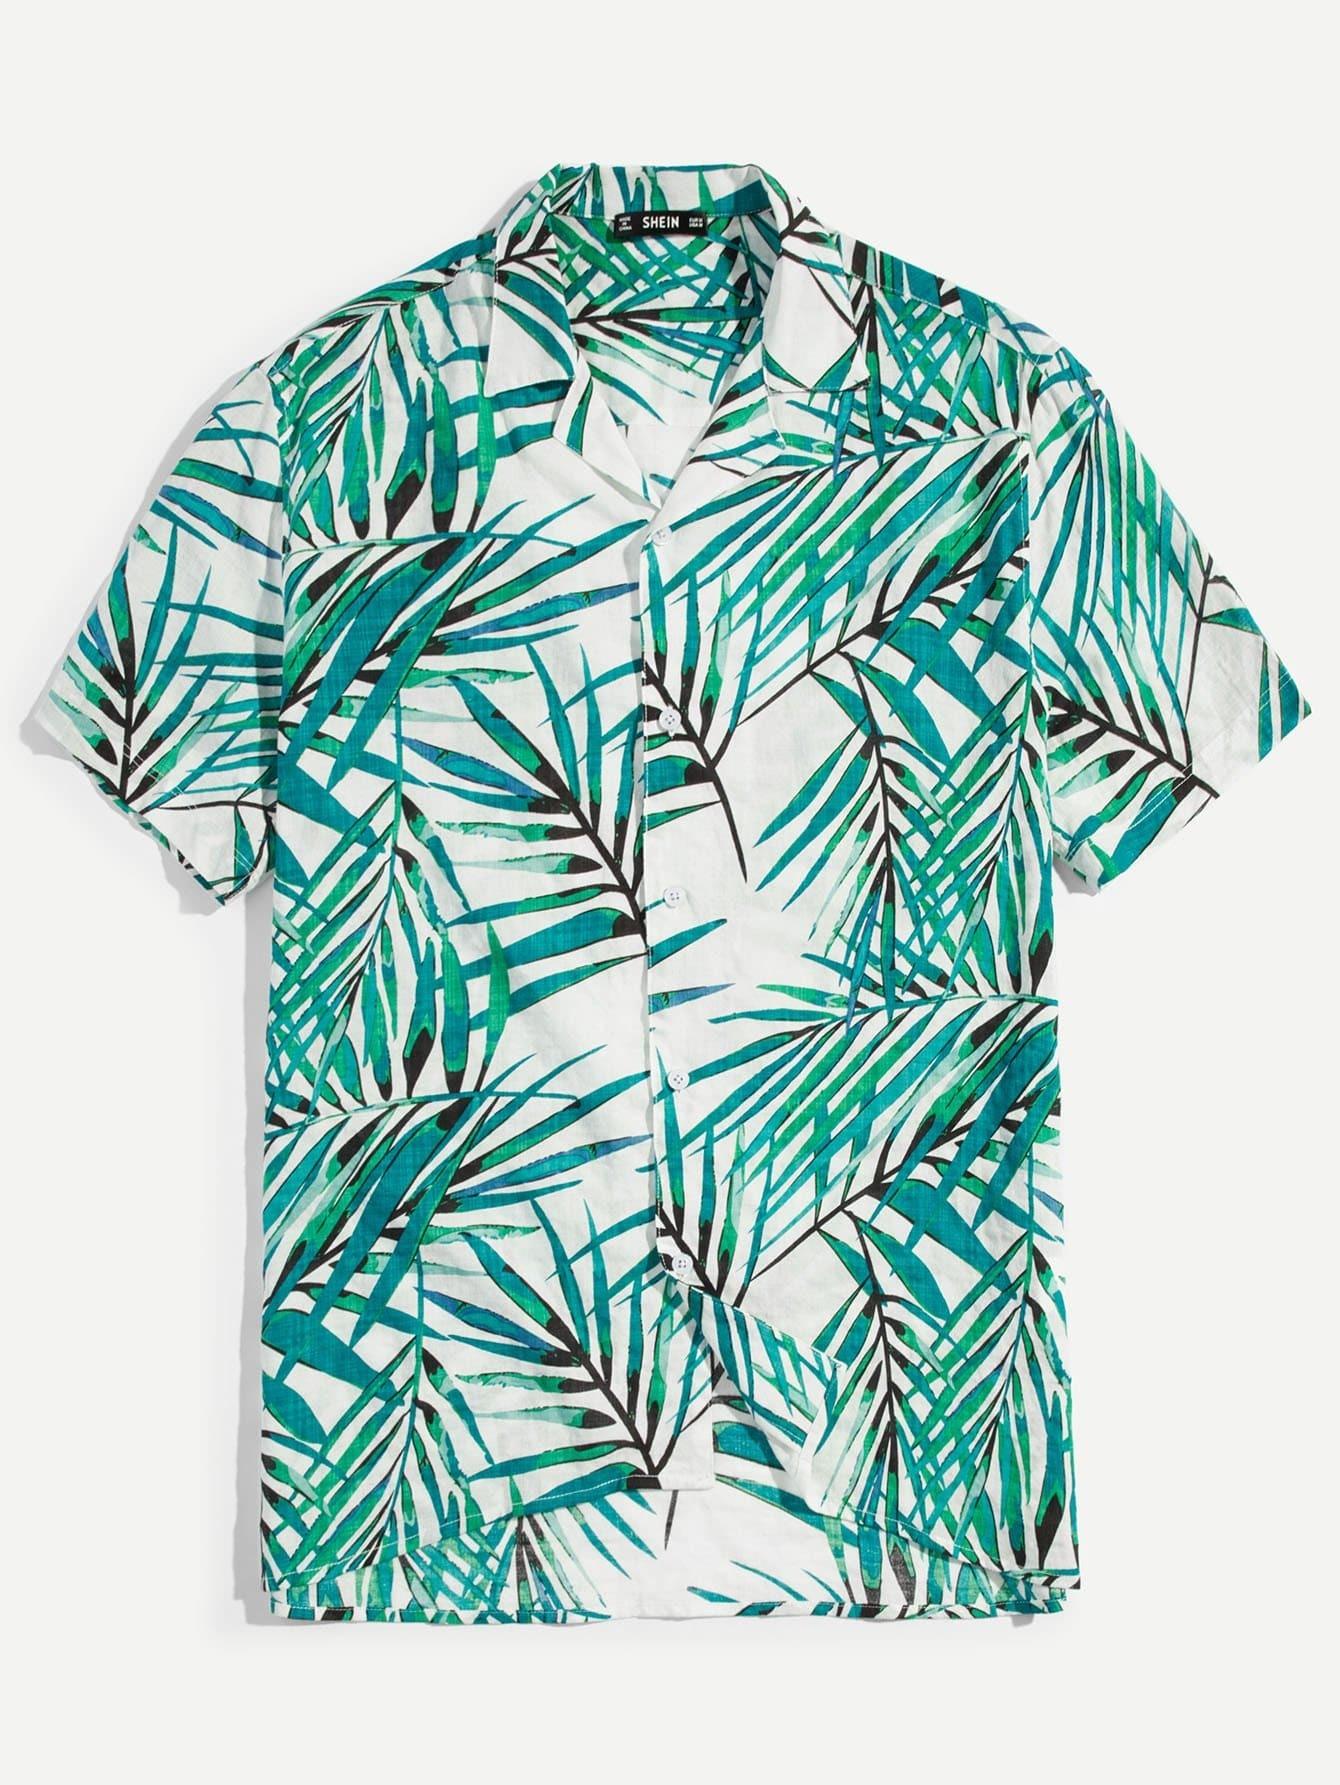 Мужчины Bamboo Leaf Print Button Фронтальные рубашки